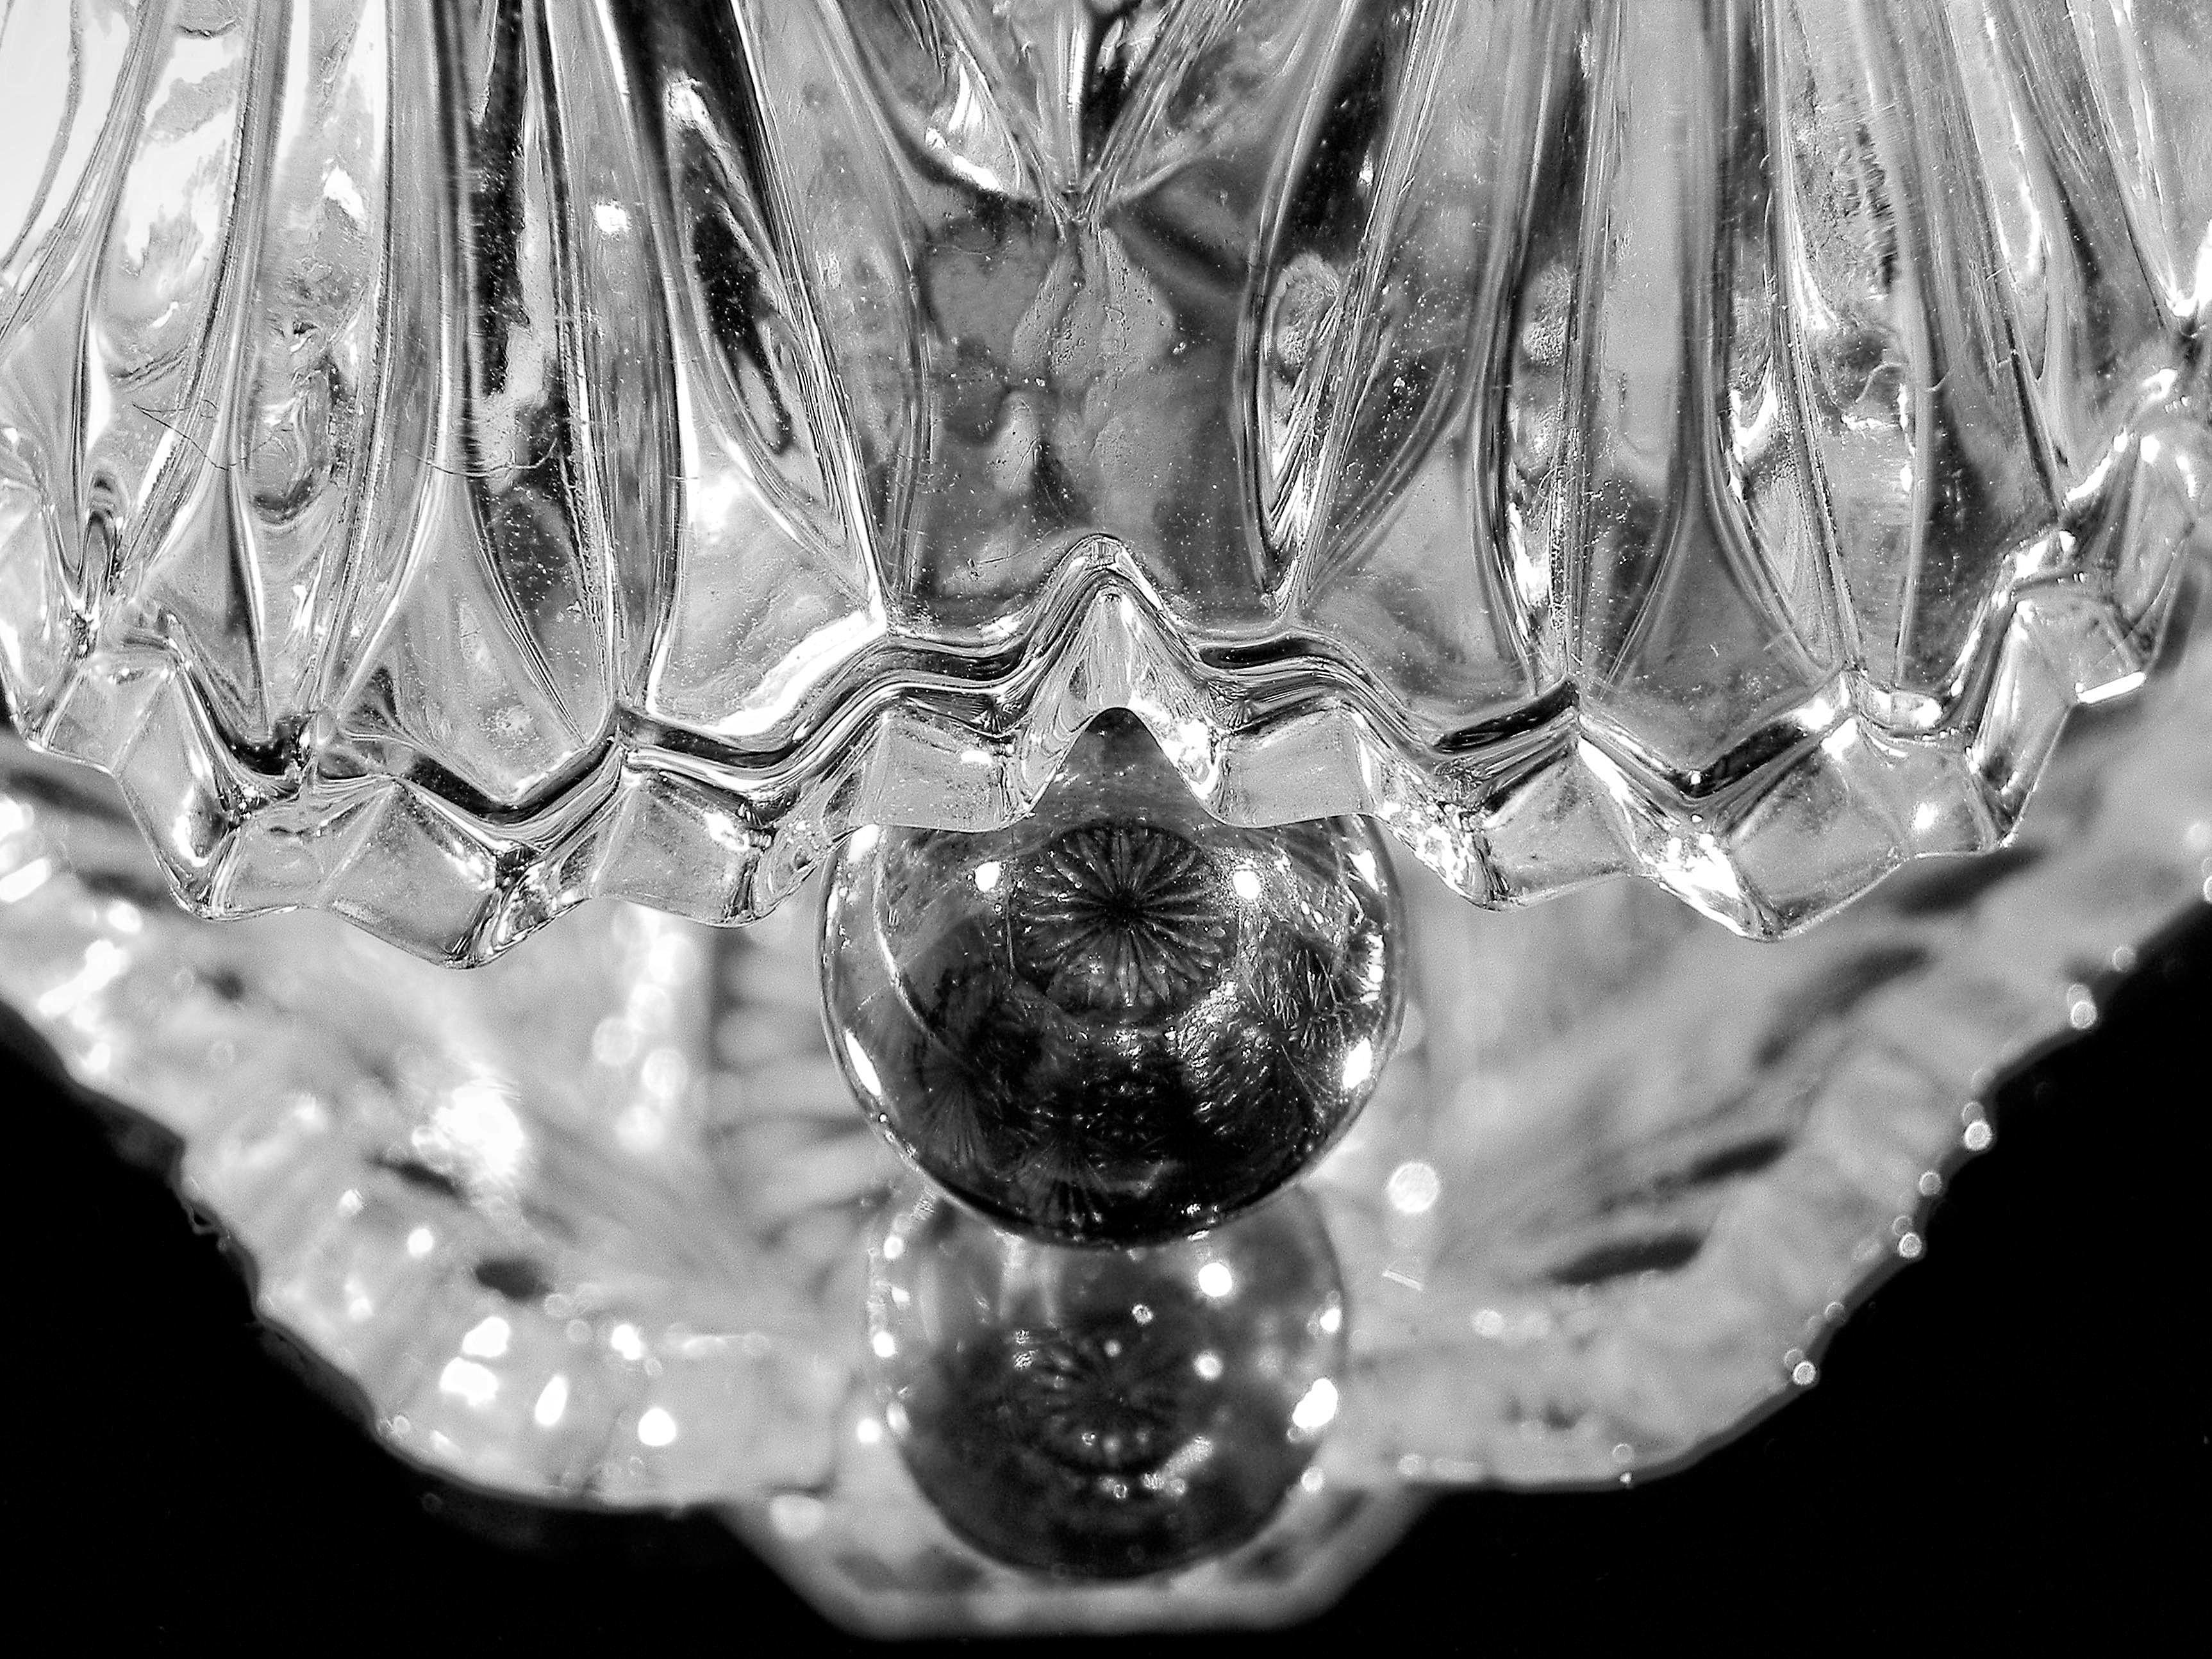 Wallpaper glass green blackandwhite macromondays bw design glass green blackandwhite macromondays bw design eye marble pupil iris flower lotus symbols reflections biocorpaavc